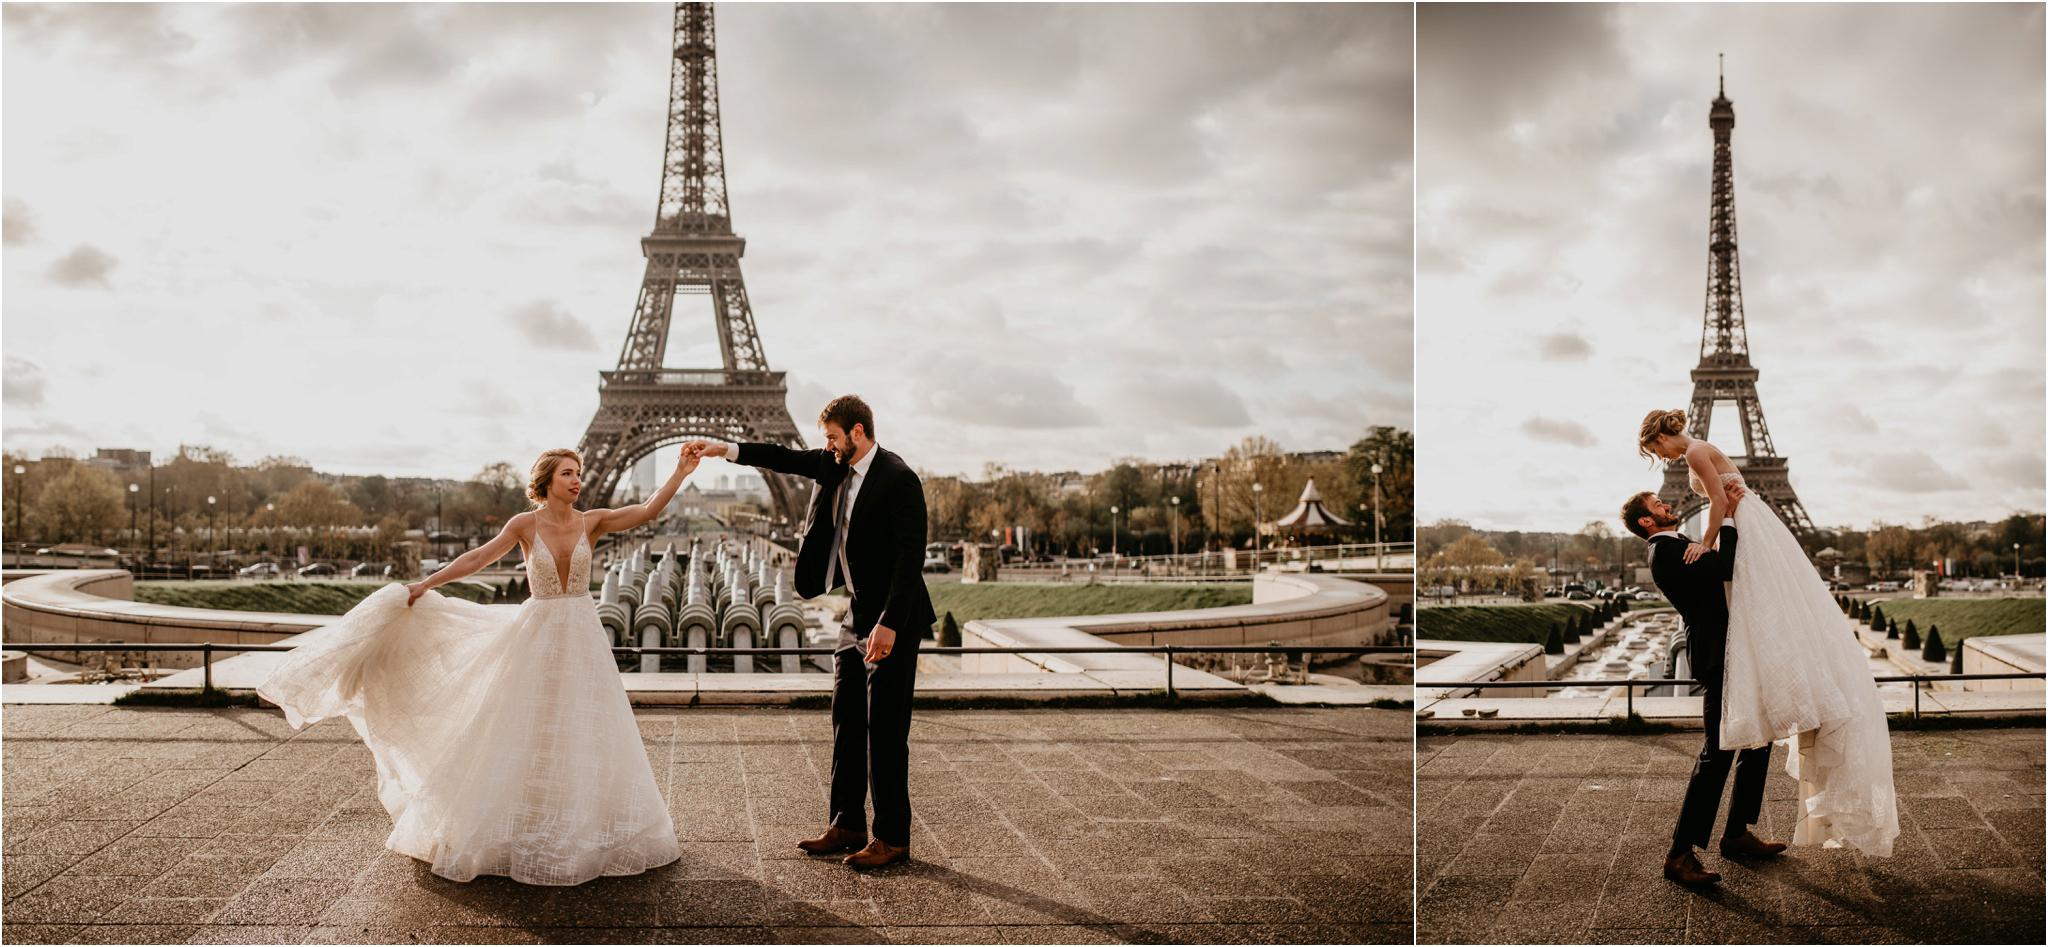 miranda-and-jared-paris-elopement-destination-wedding-photographer-069.jpg